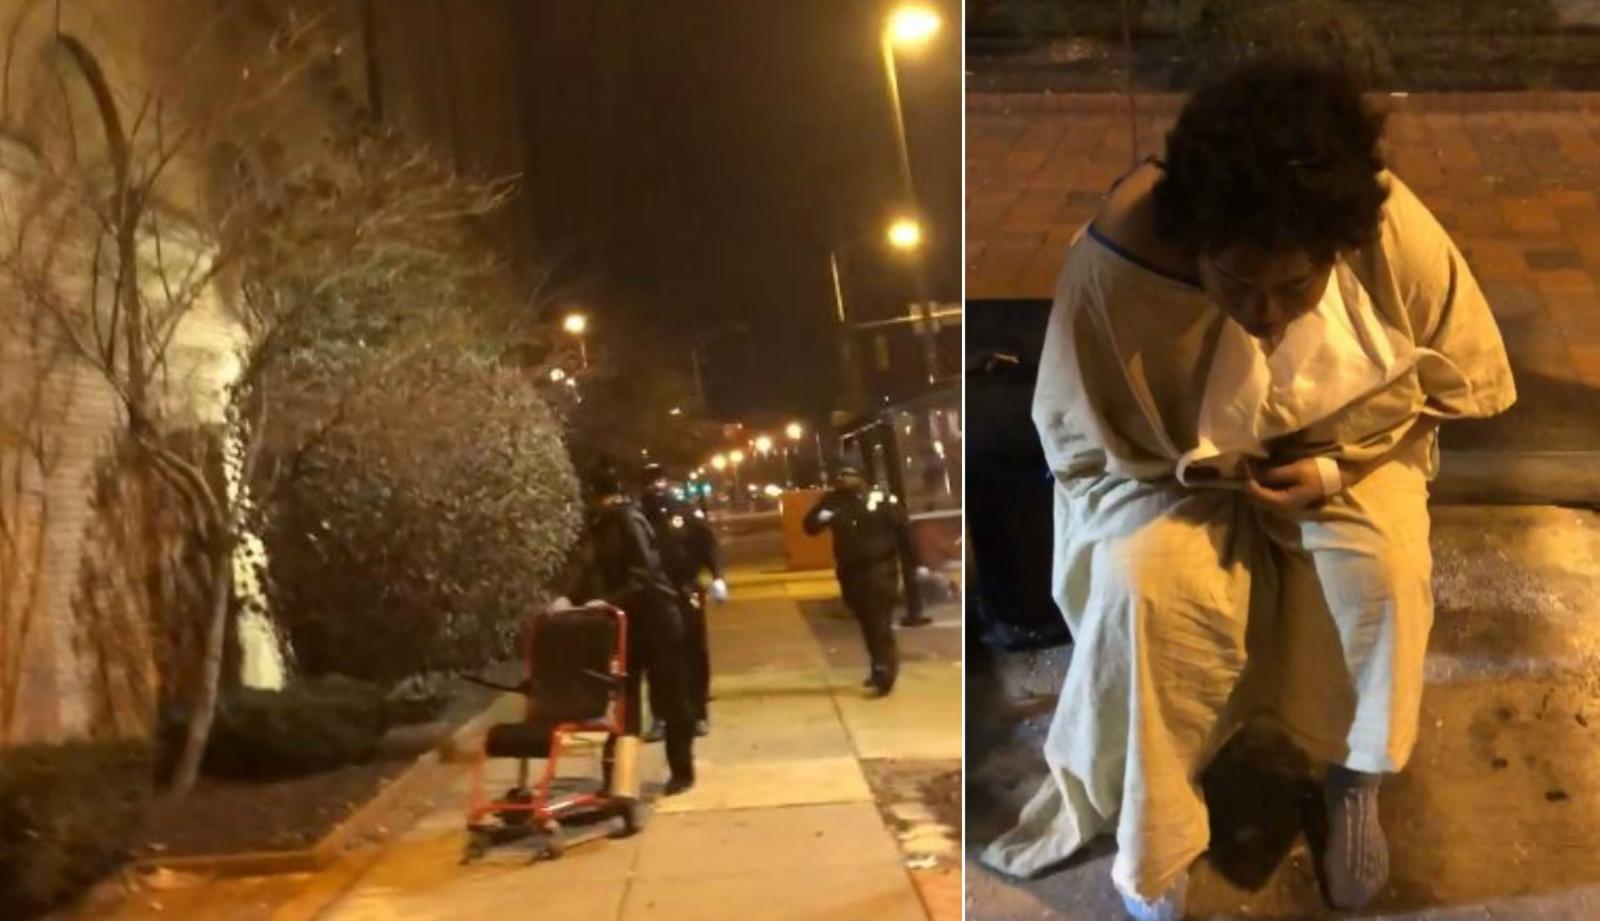 Baltimore hospital guards dump patient on freezing street